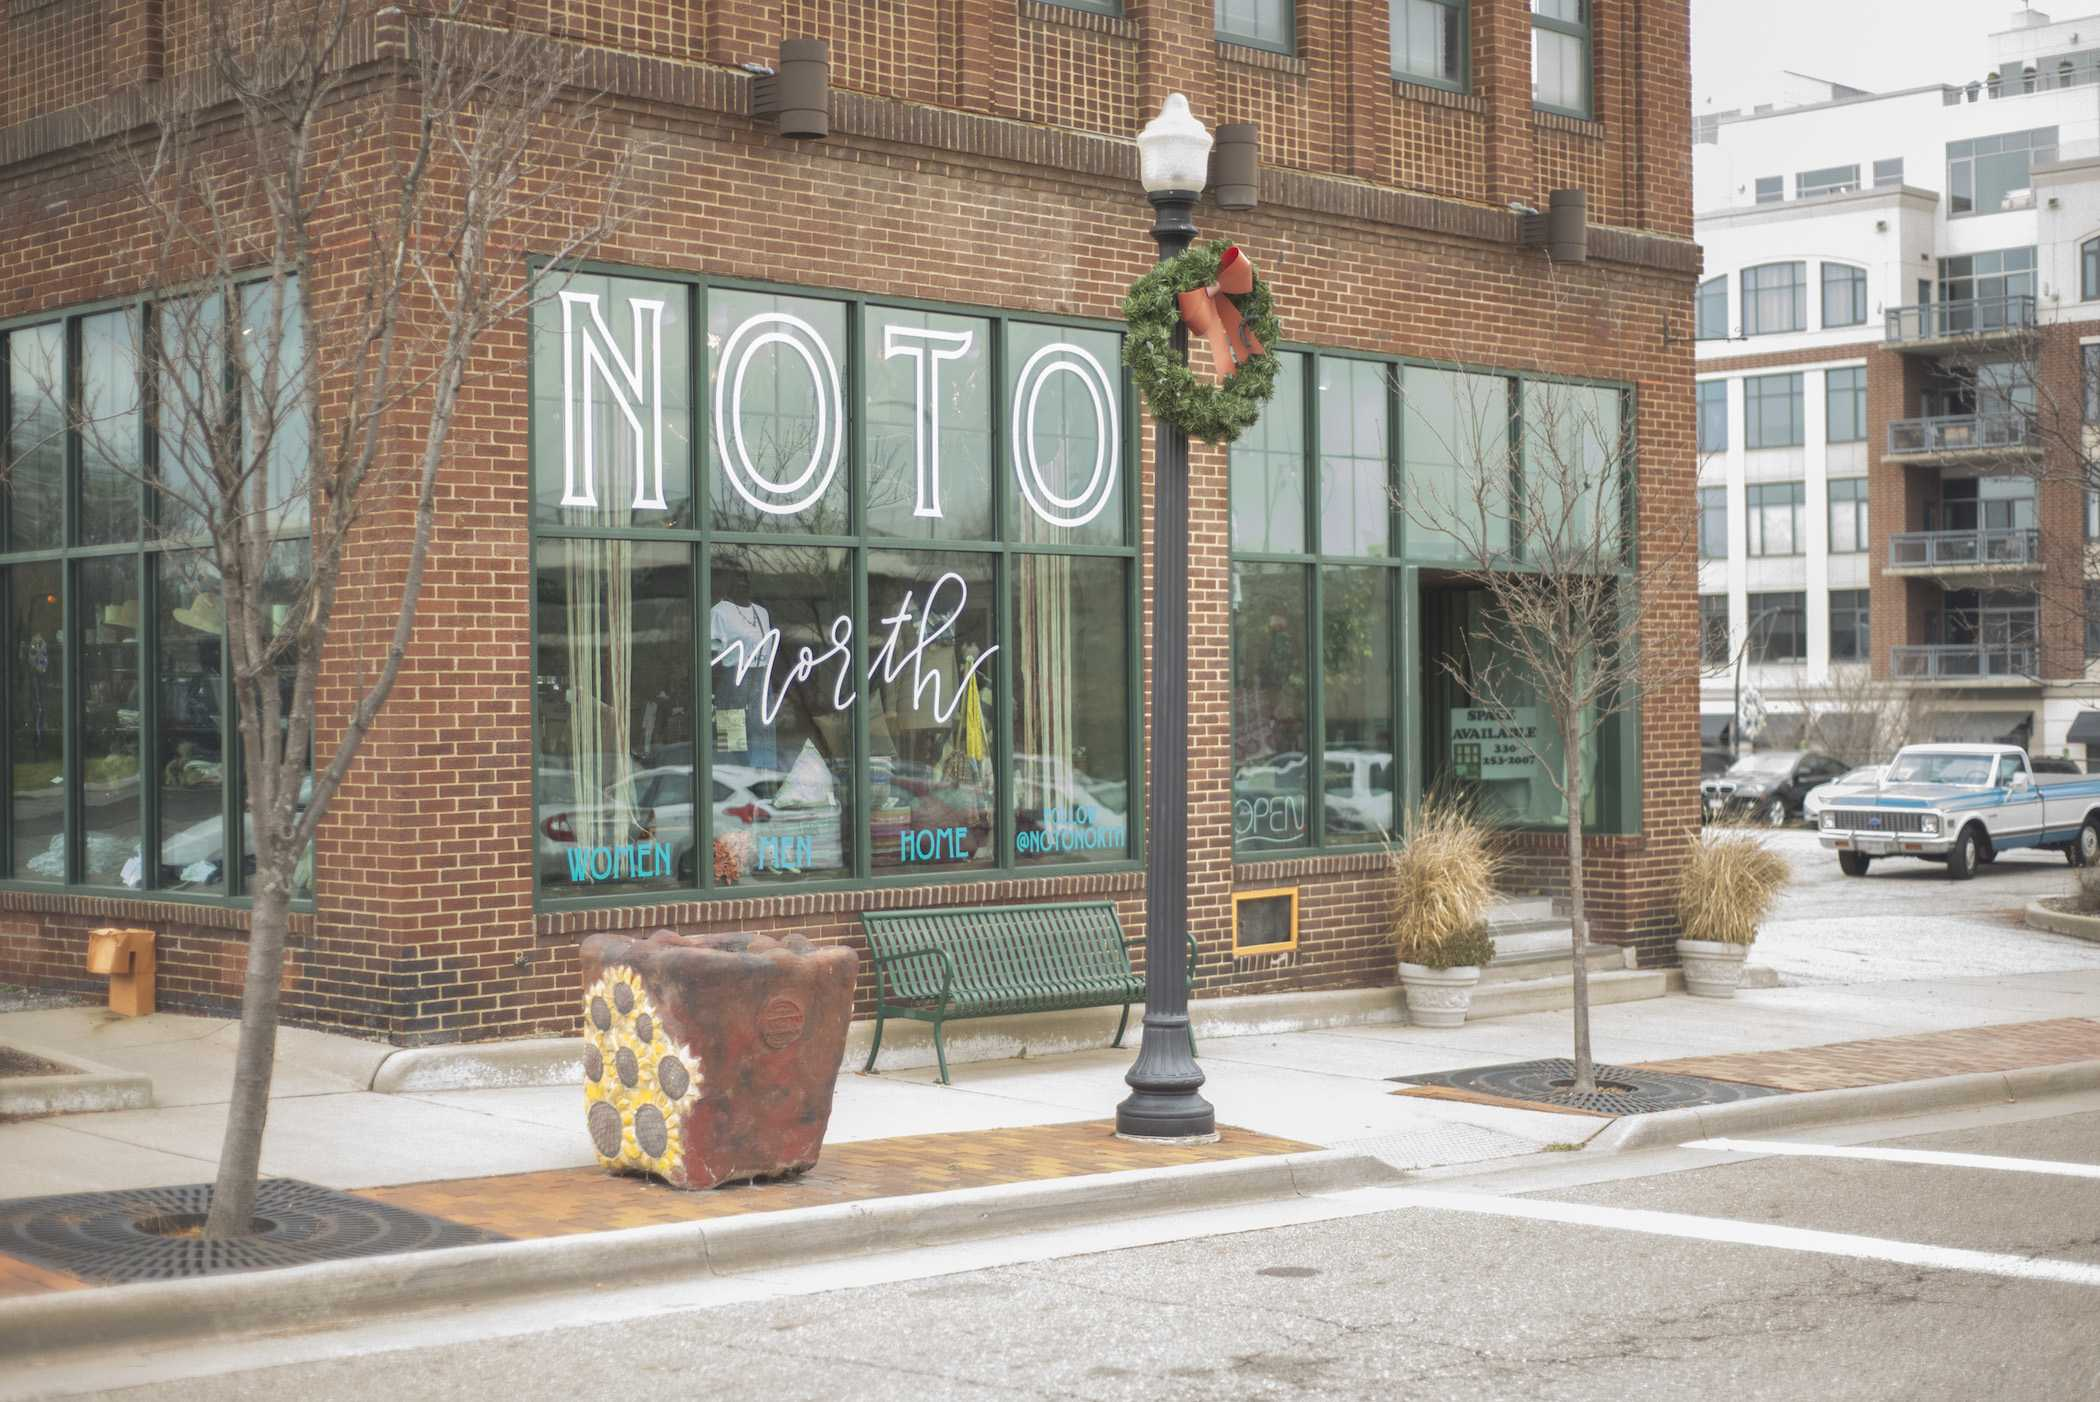 NOTO North is located across from Luigi's Italian Restaurant.